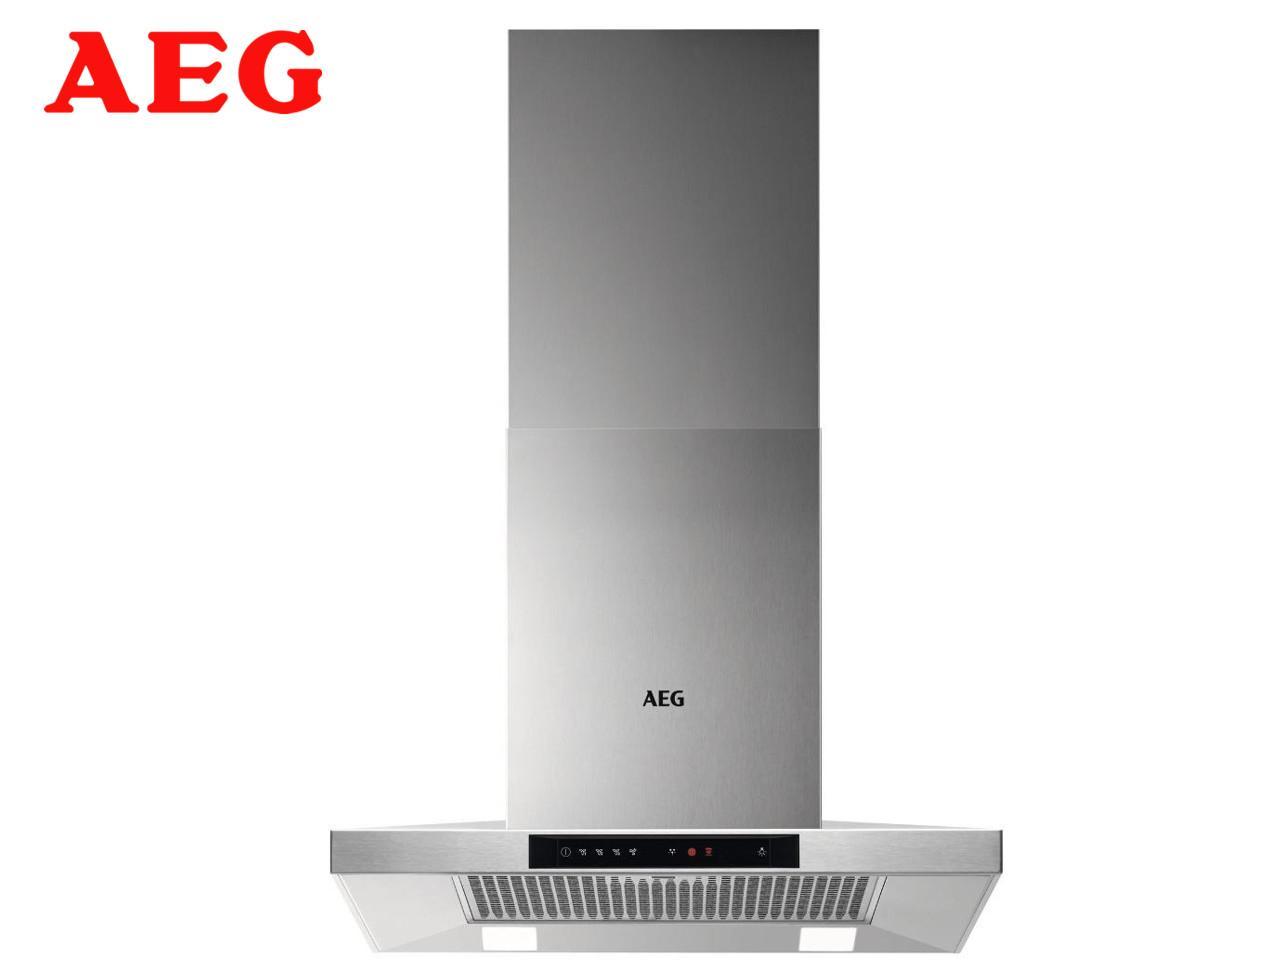 AEG DKB5660HM